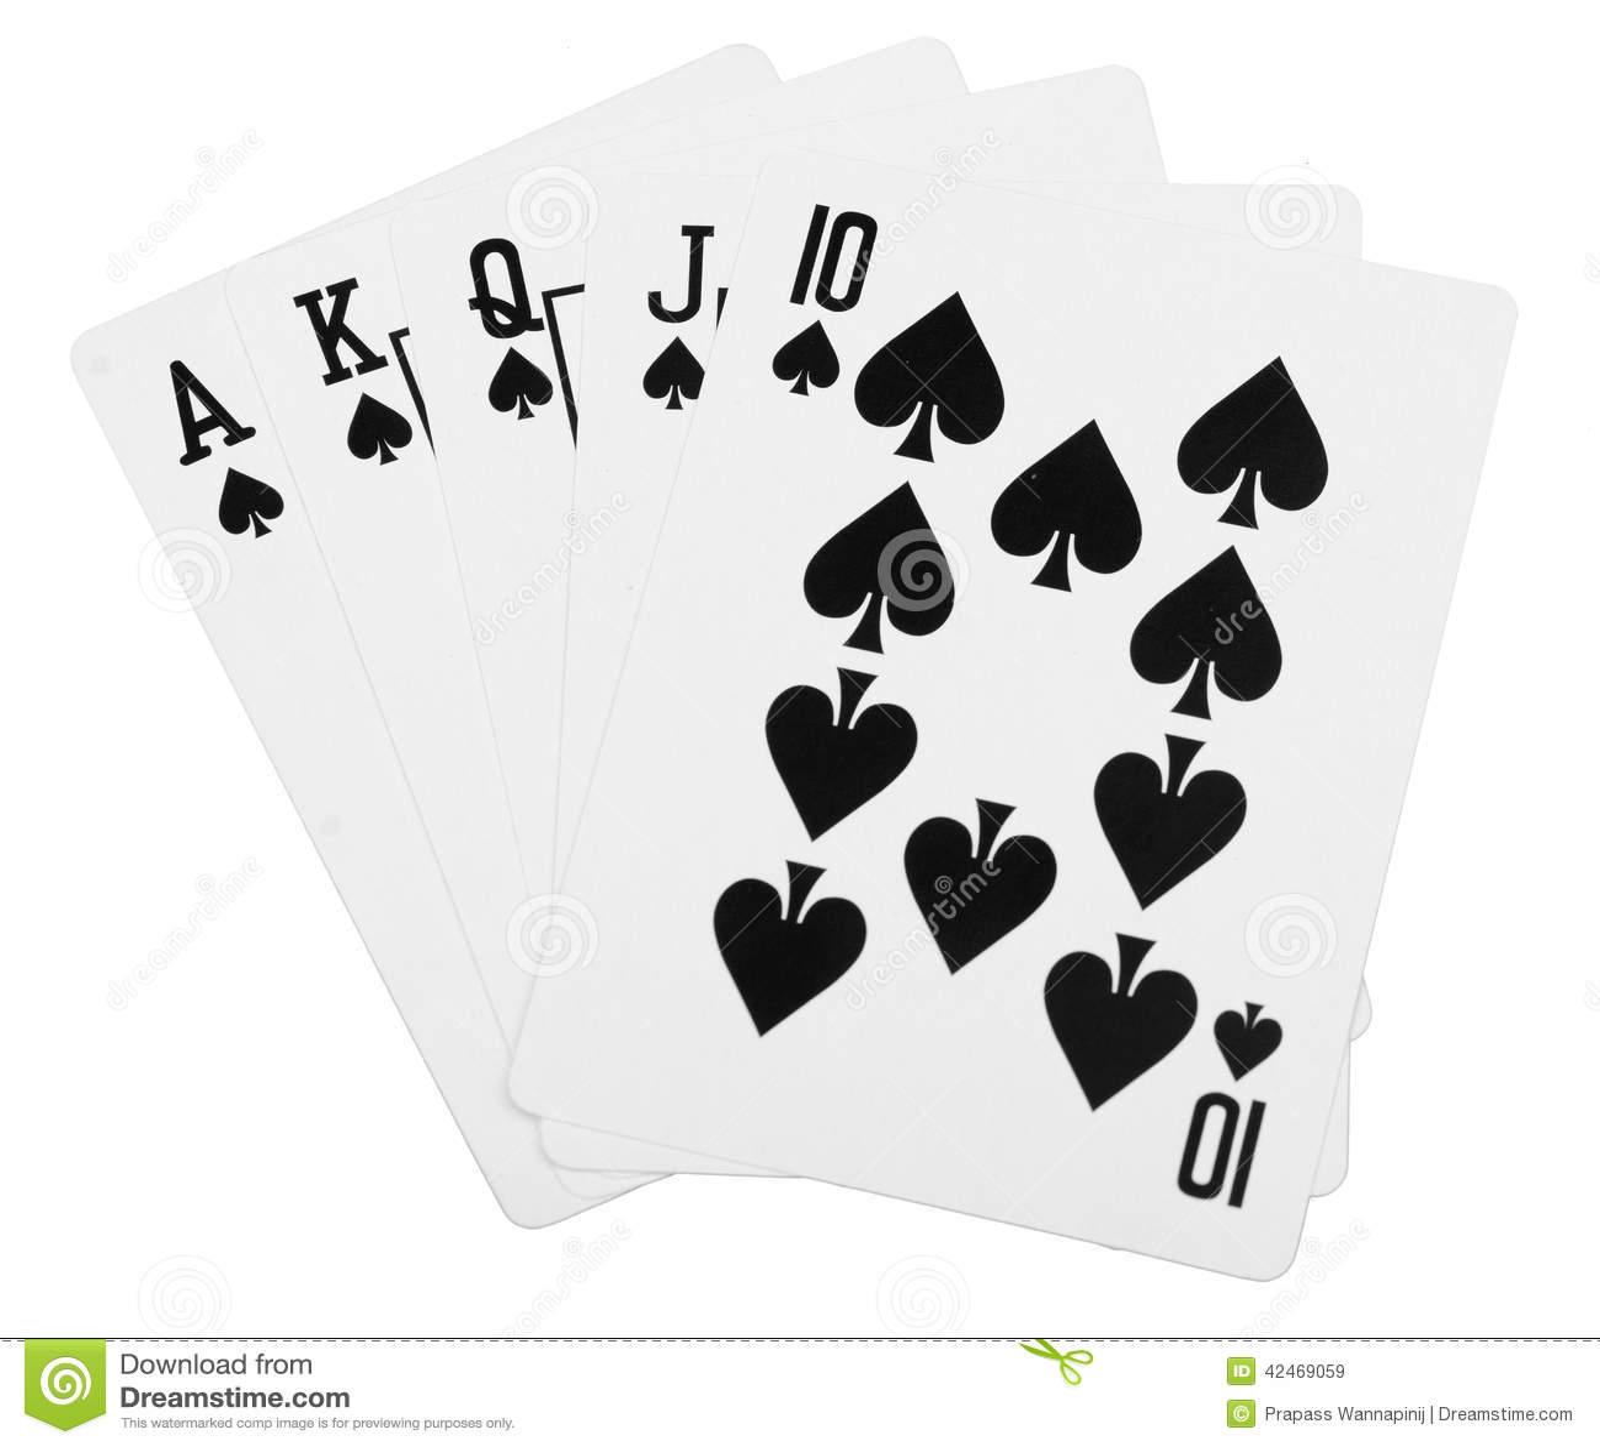 Pokerstars find a player